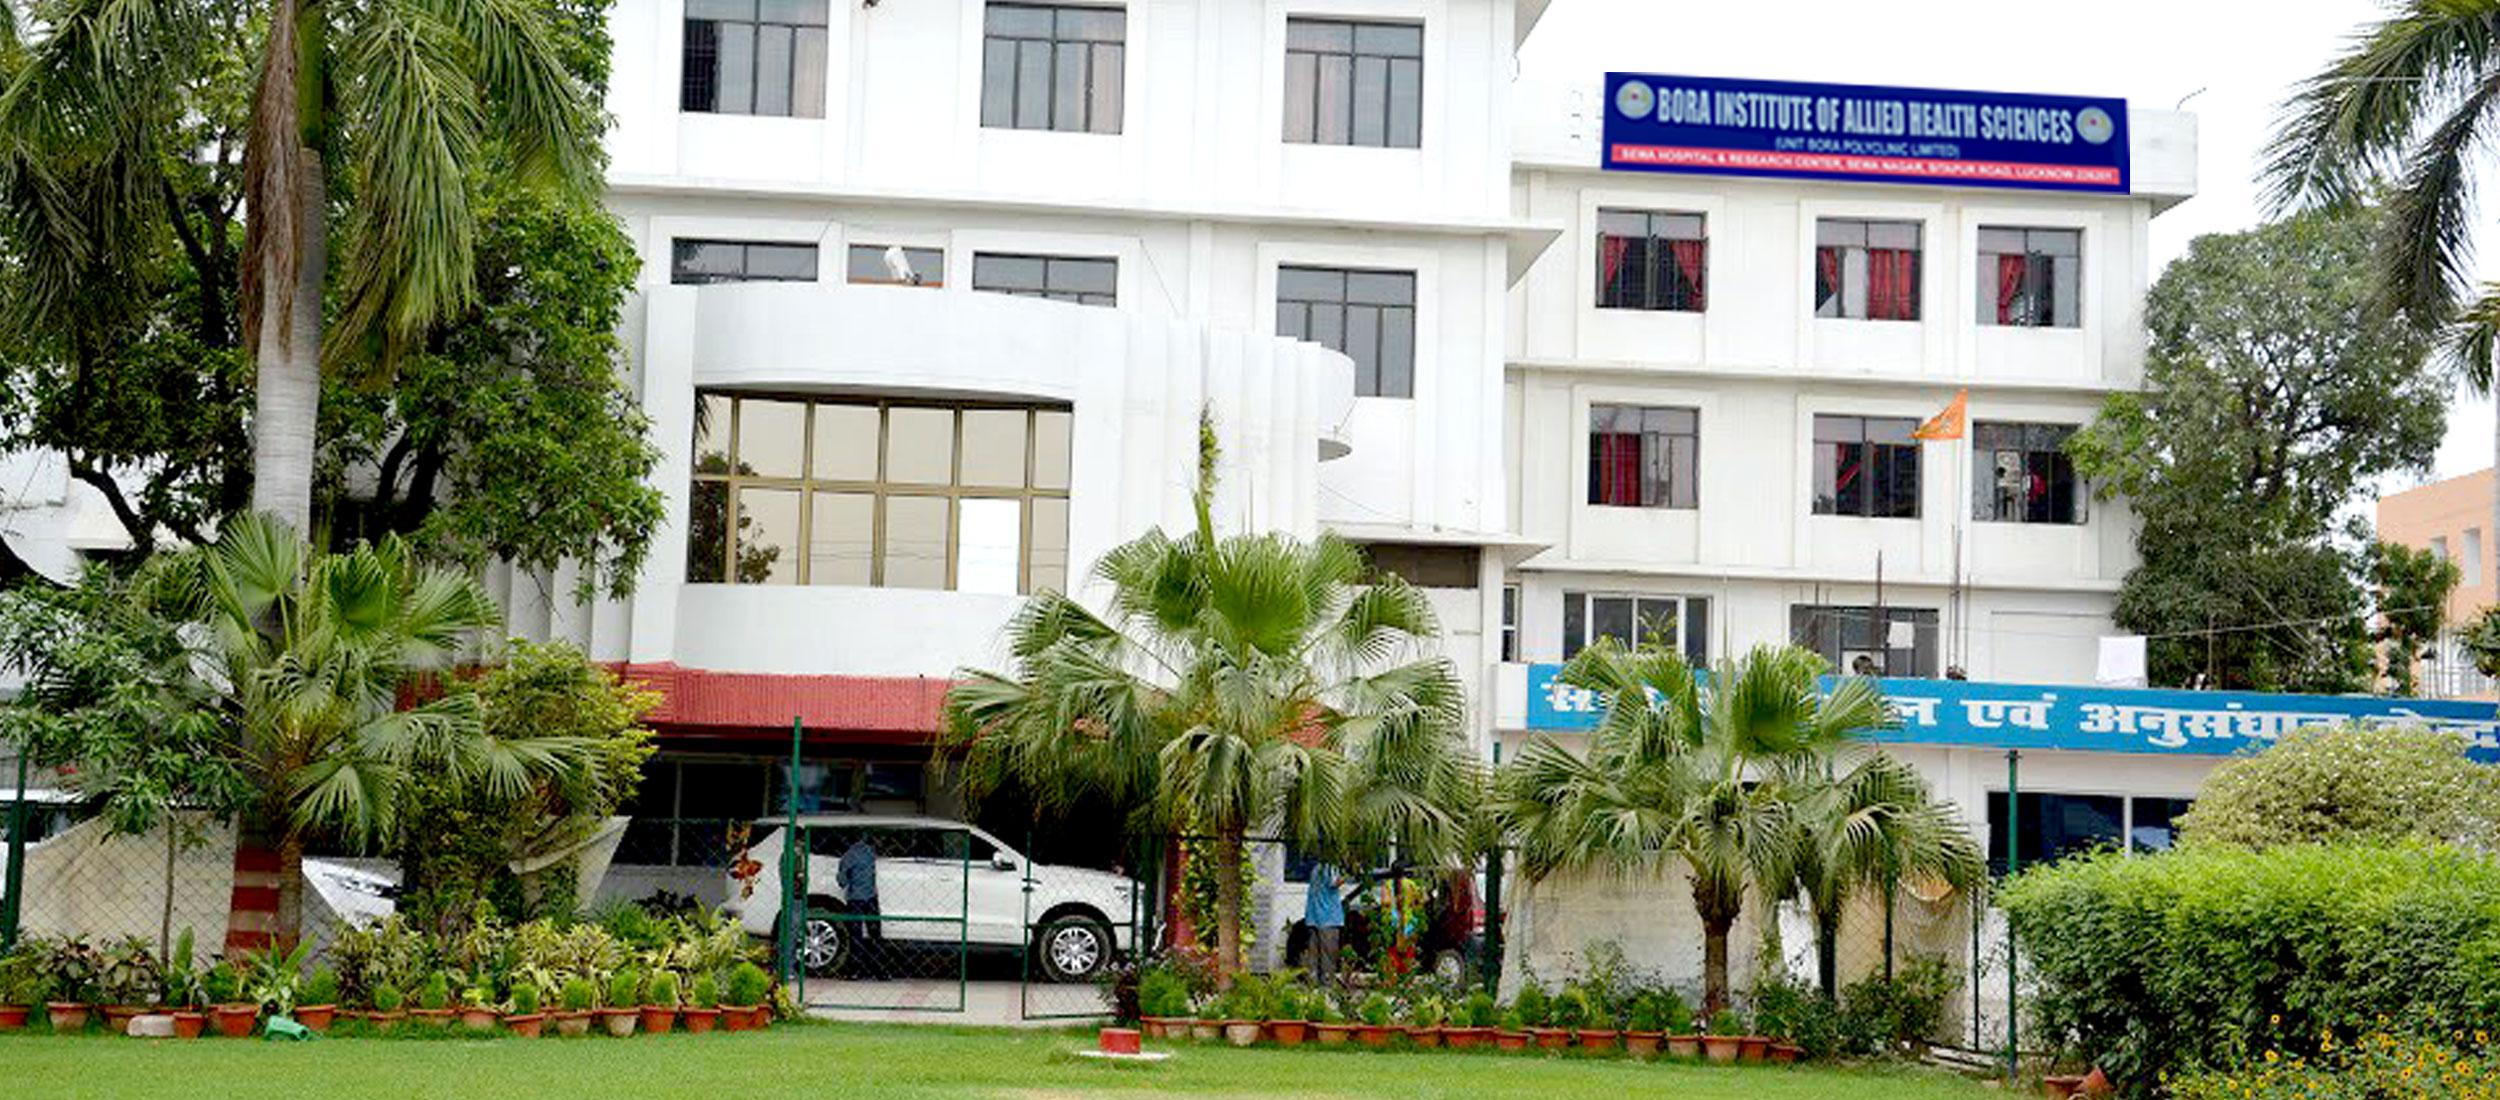 Bora Institute of Allied Health Sciences Sewa Hospital Research Center Image